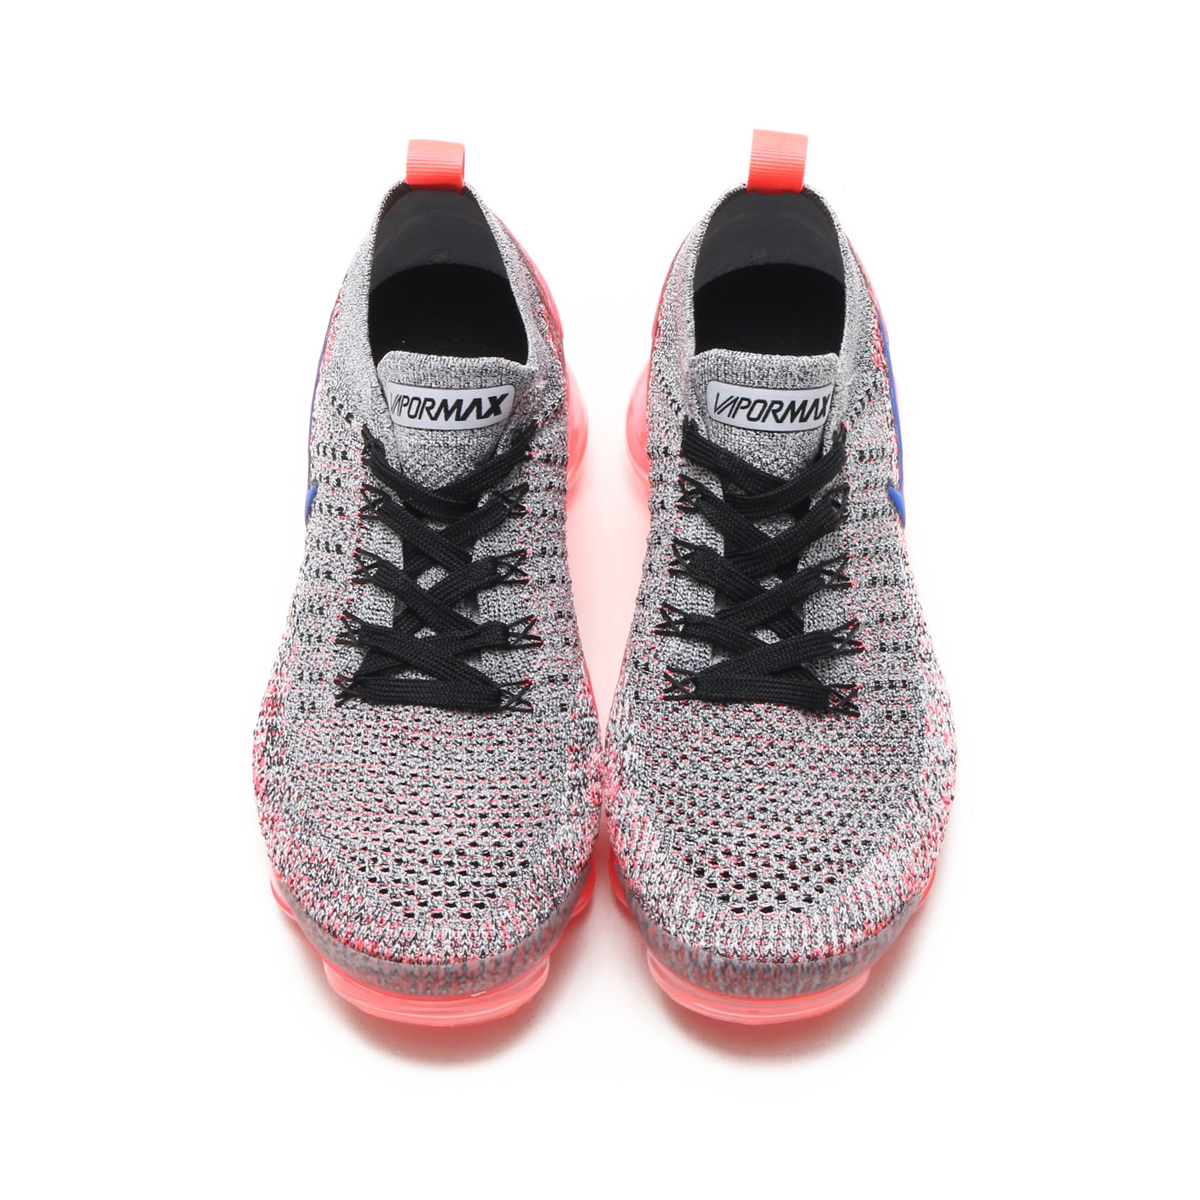 543158d2ab5a NIKE W AIR VAPORMAX FLYKNIT 2 (Nike women air vapor max fried food knit 2)  (WHITE ULTRAMARINE-HOT PUNCH-BLACK) 18SU-S